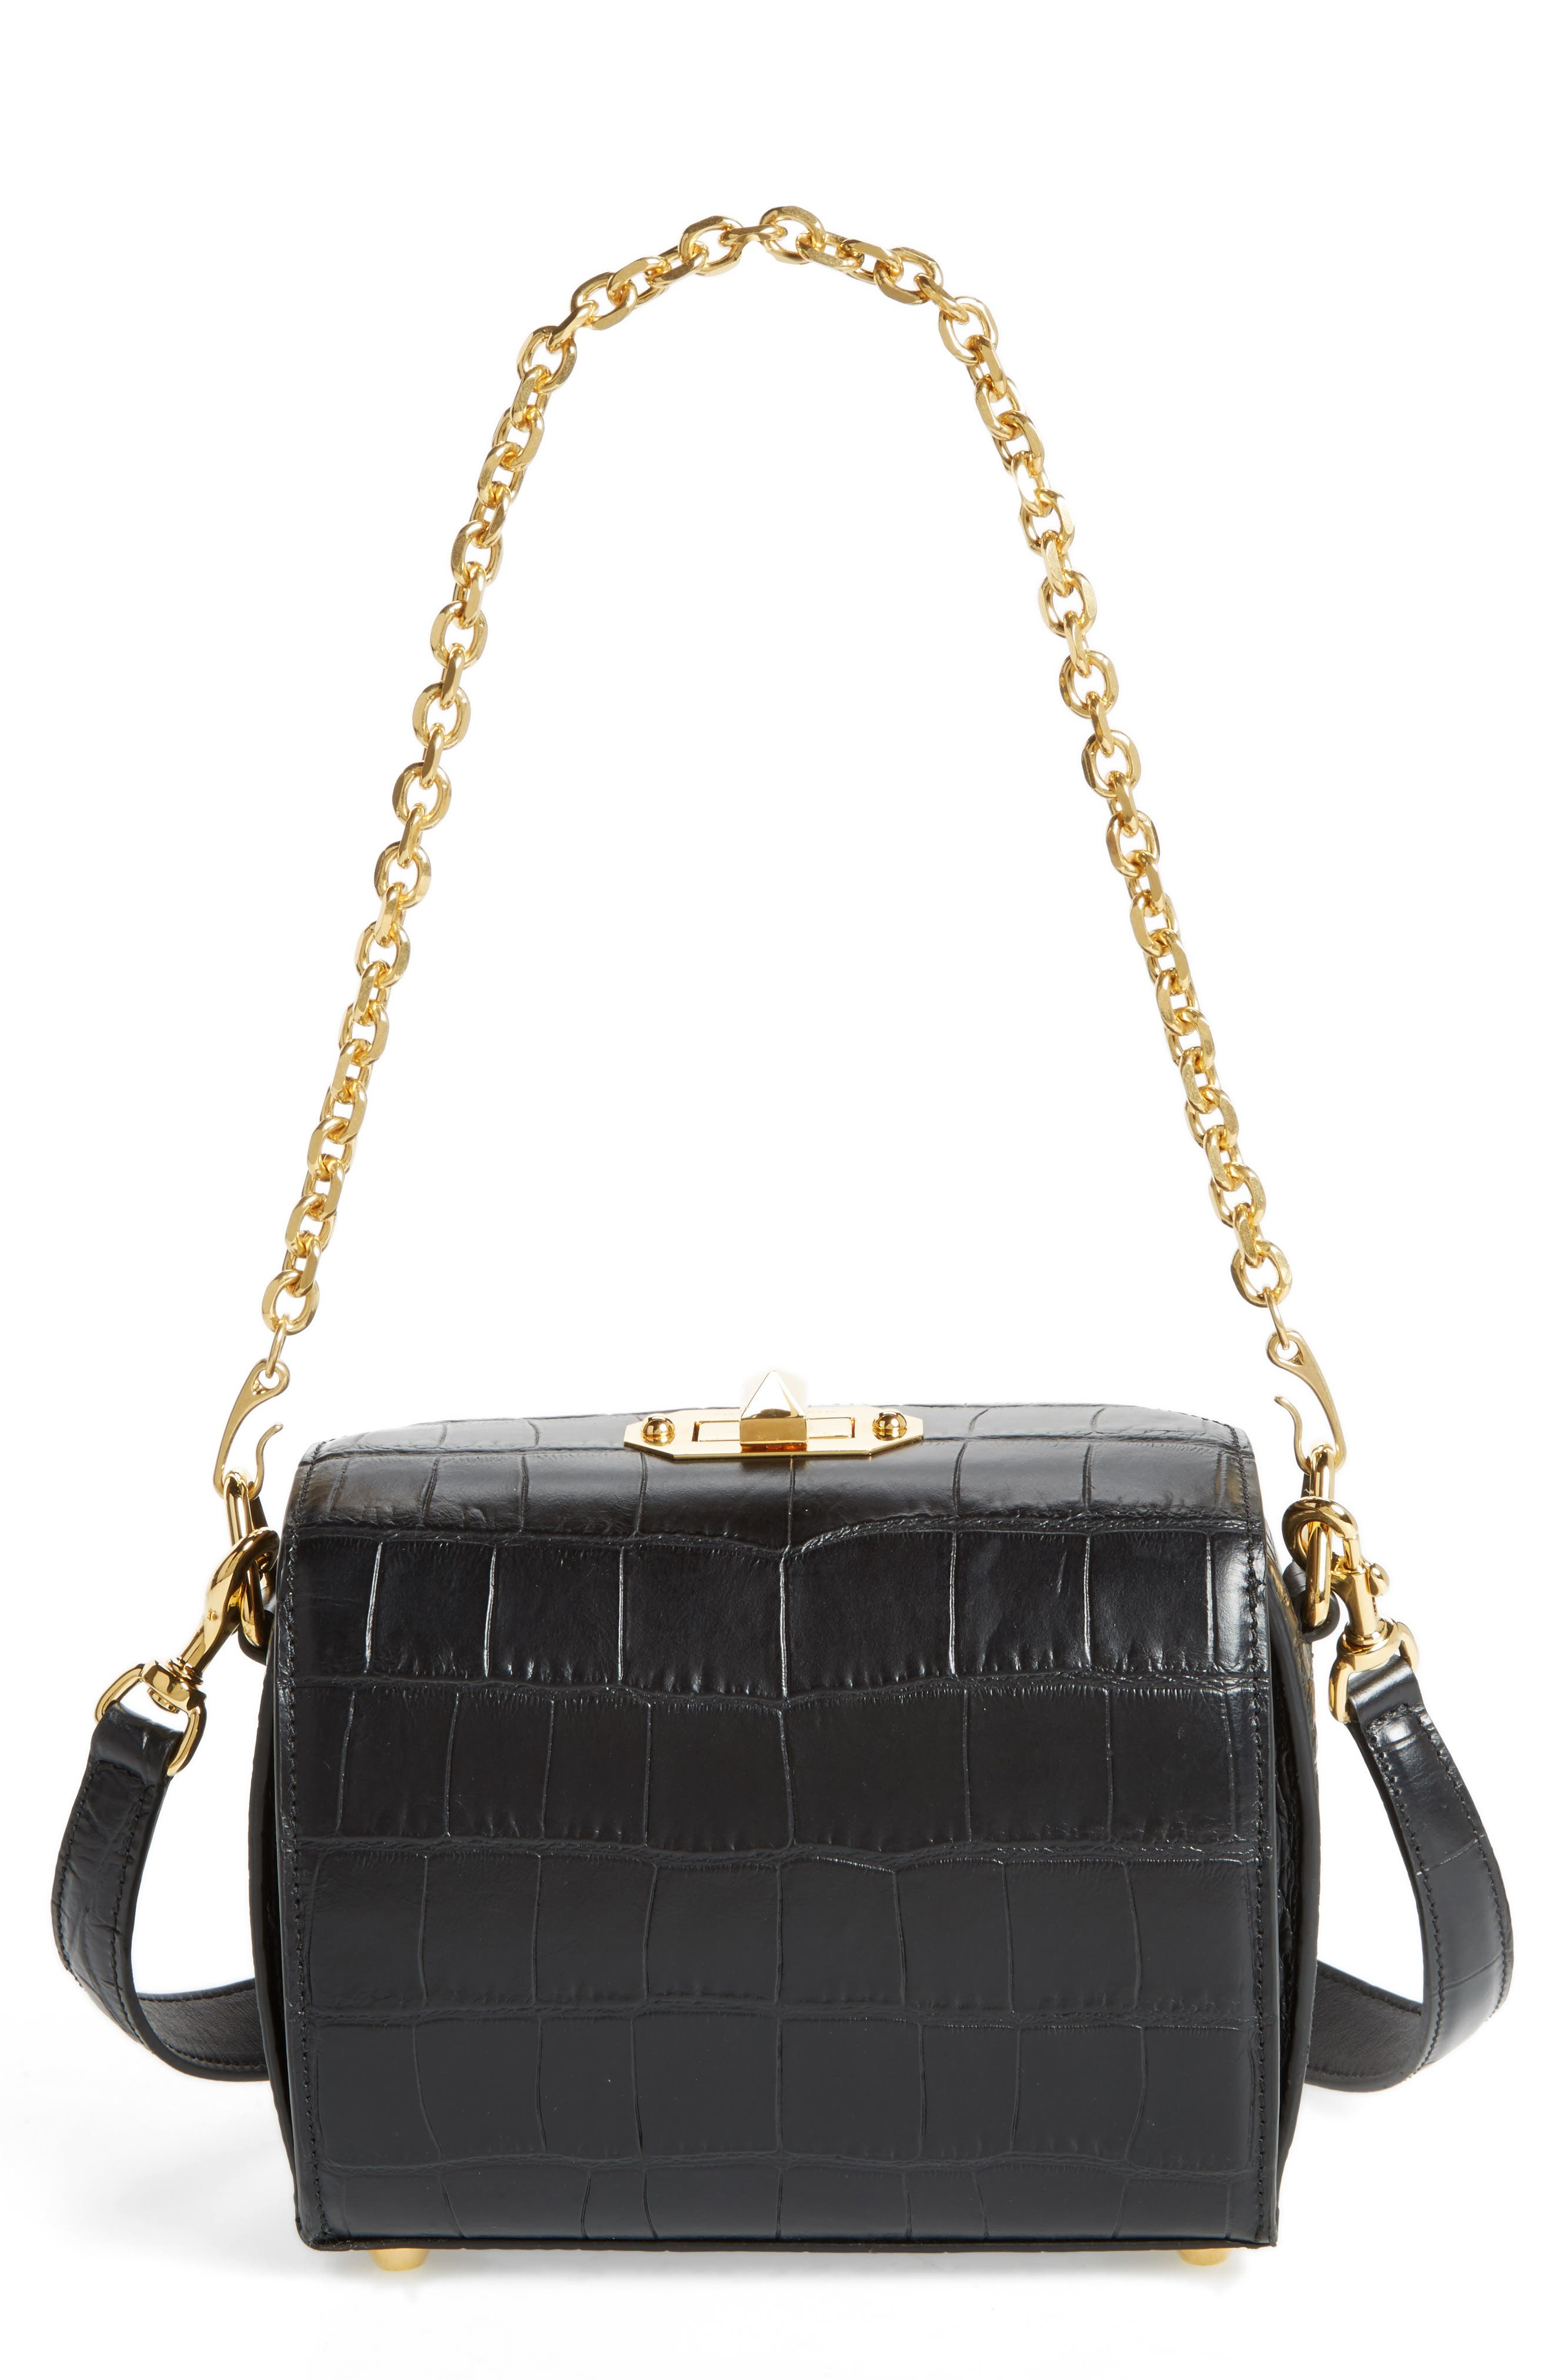 Box Bag 19 Croc Embossed Leather Bag,                             Main thumbnail 1, color,                             Black